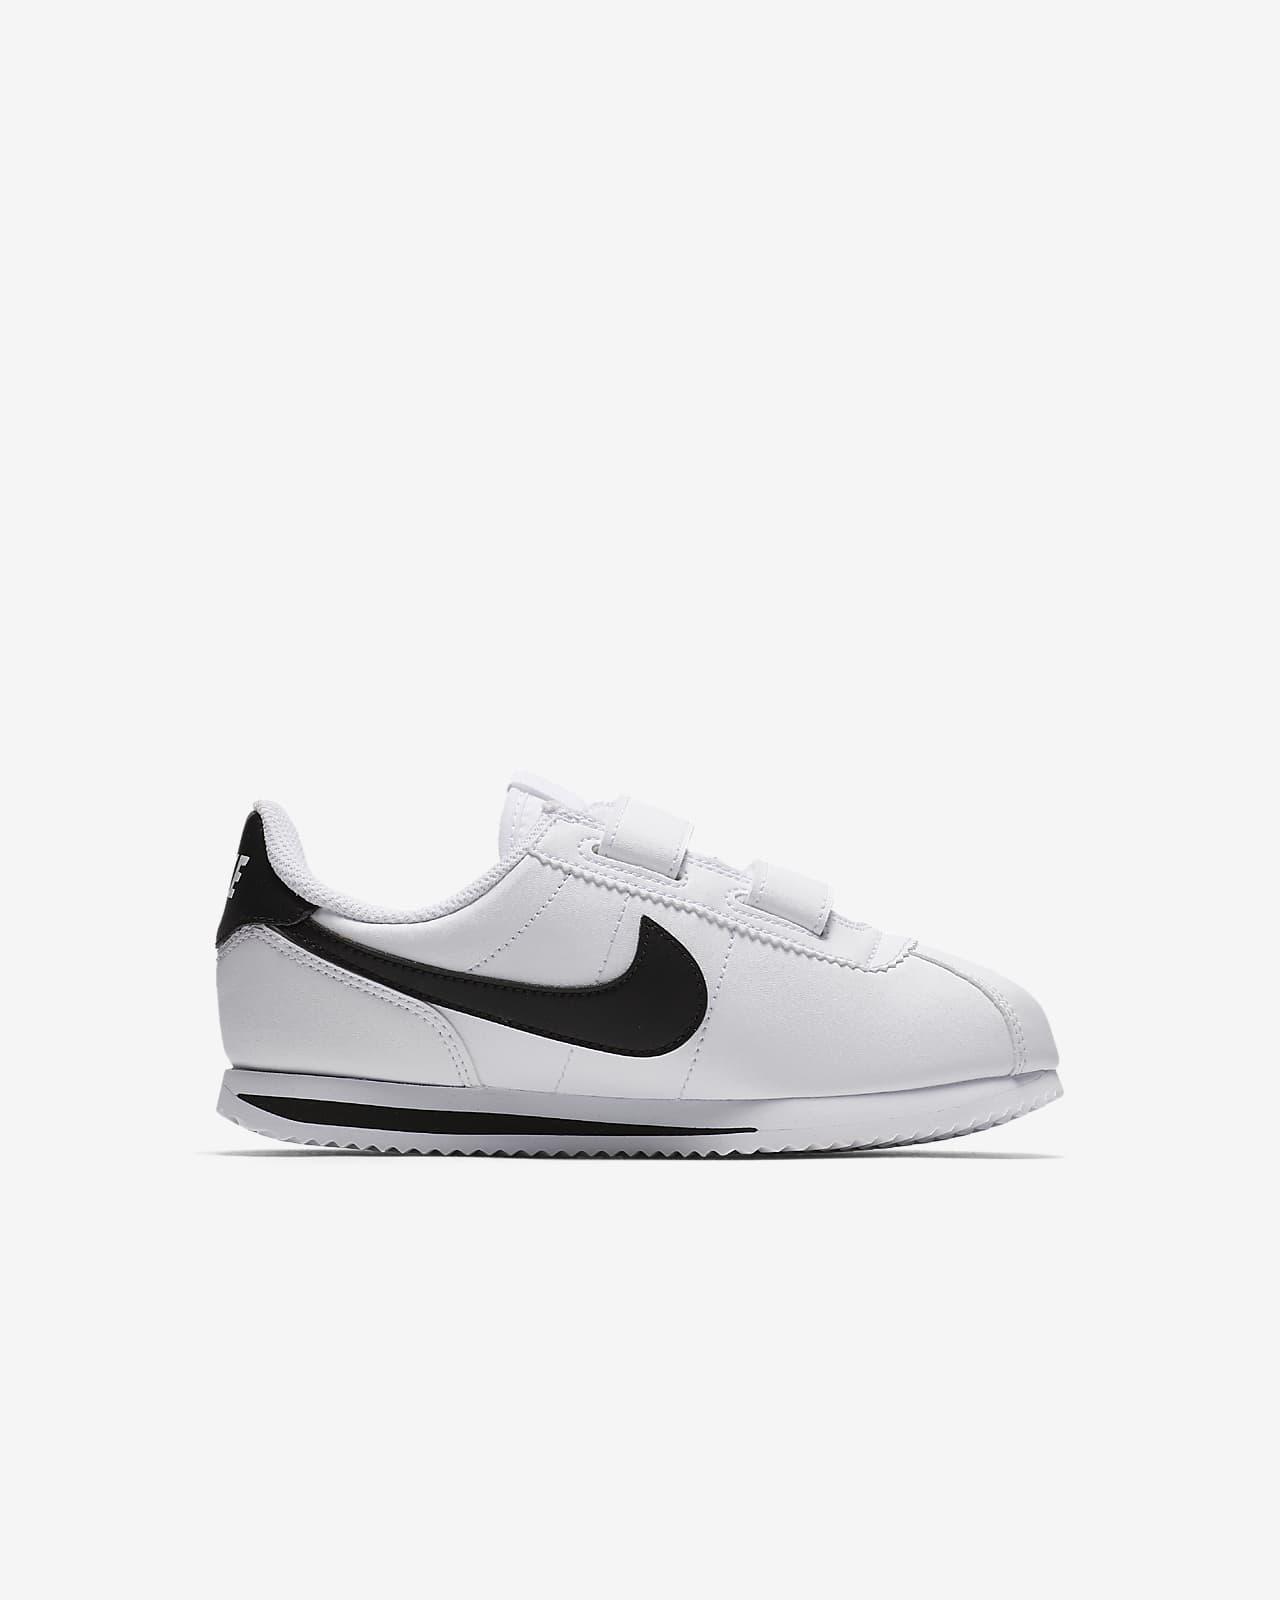 Expresión comprar Pronombre  Nike Cortez Basic SL Younger Kids' Shoe. Nike ID